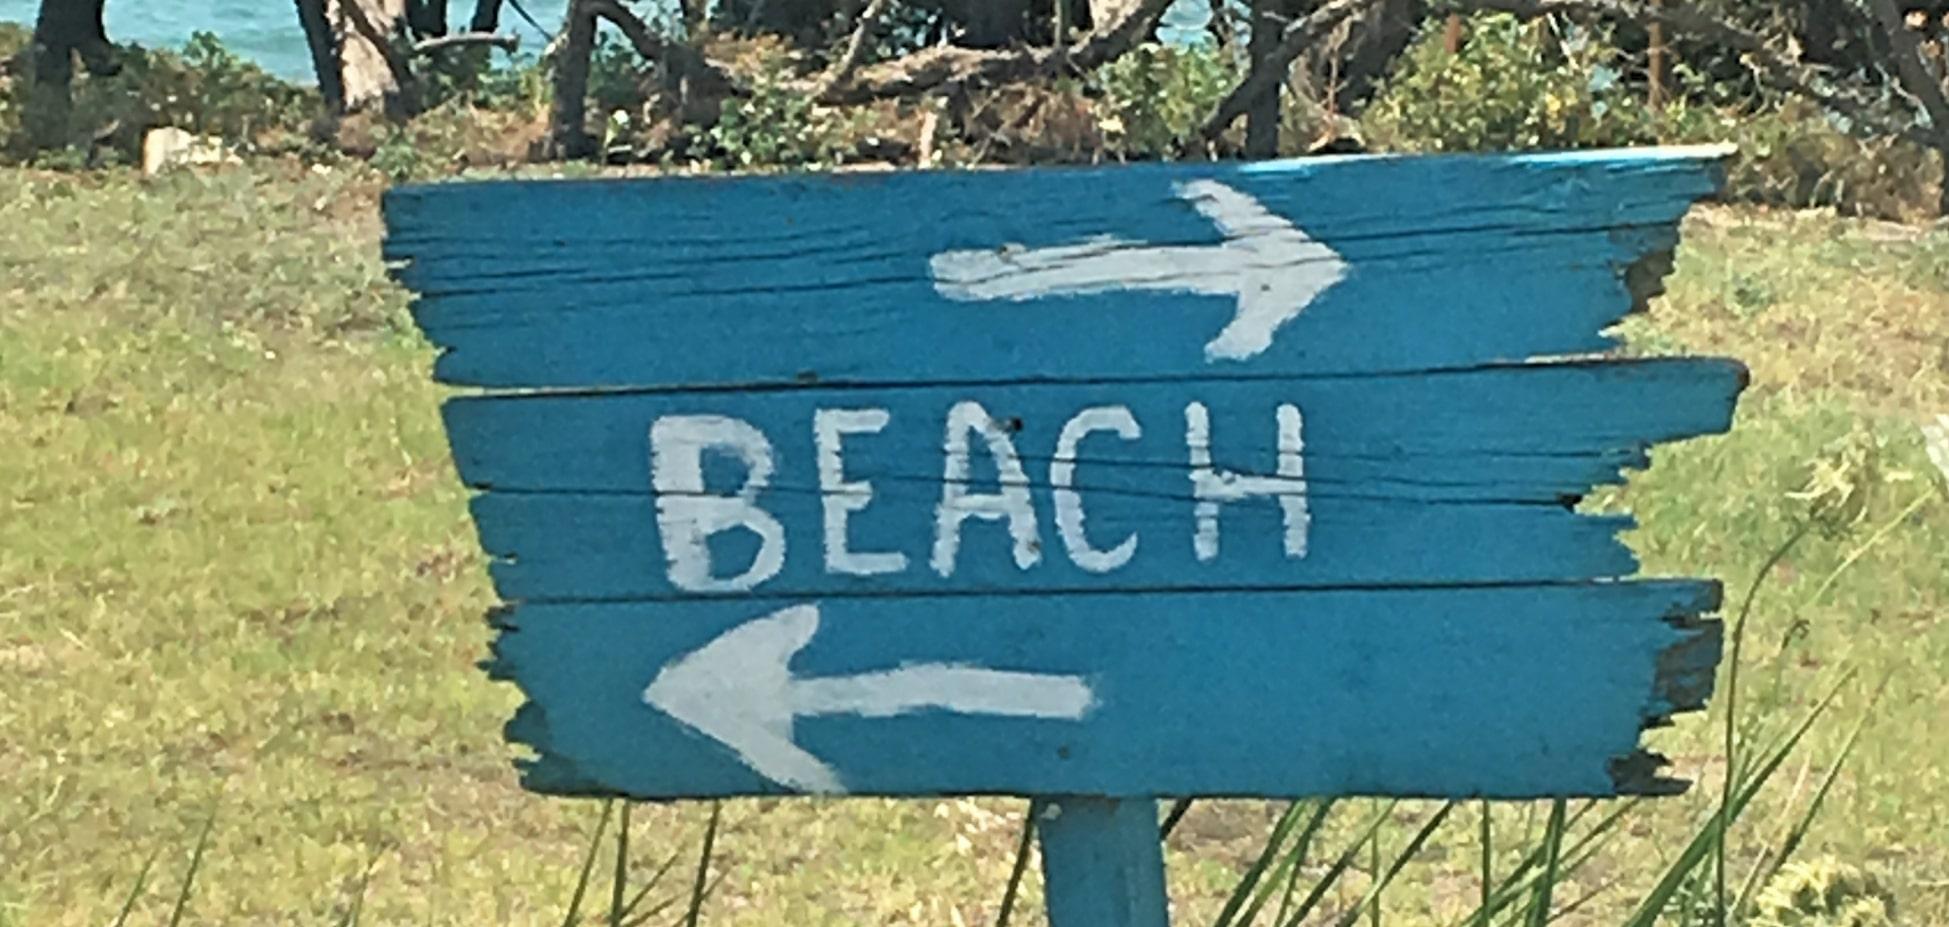 Holtzschild mit Strandangabe